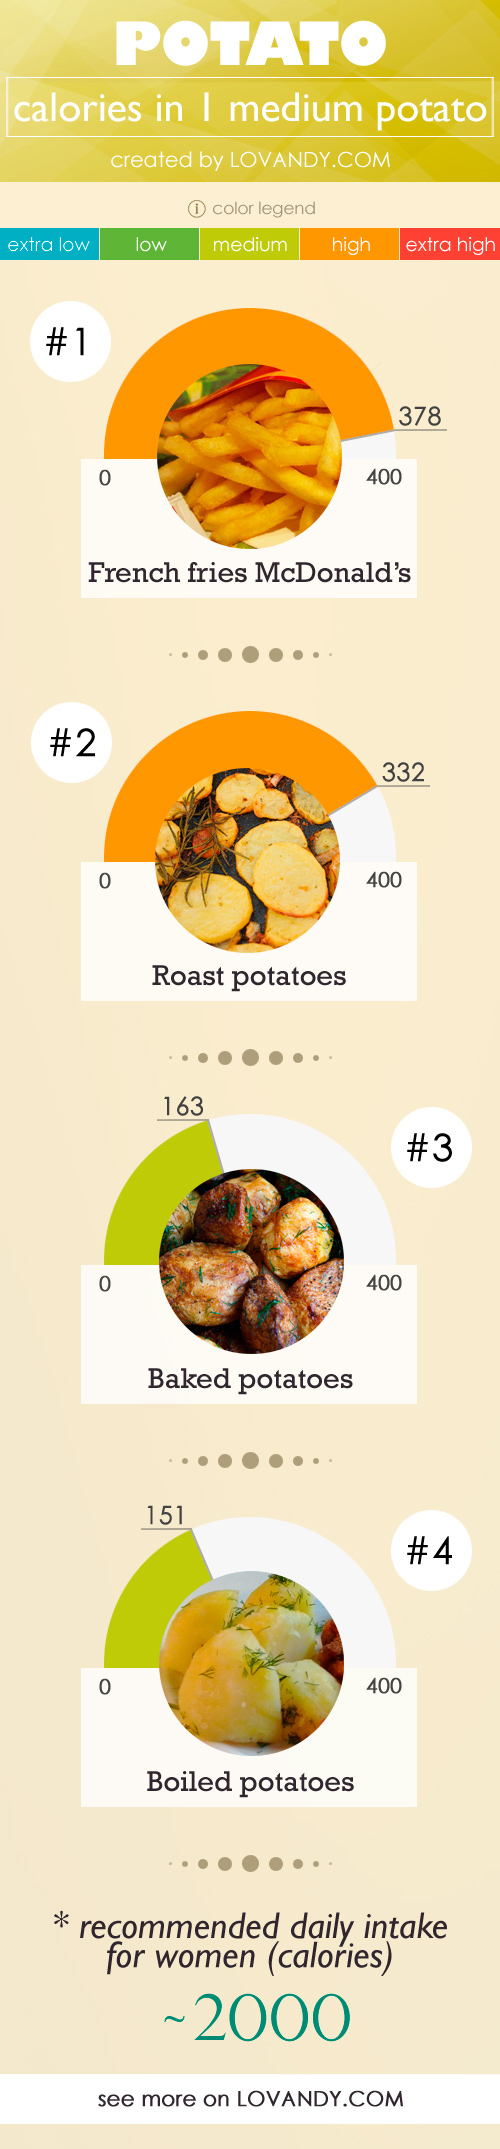 Calorie mashed potatoes per 100 grams 61